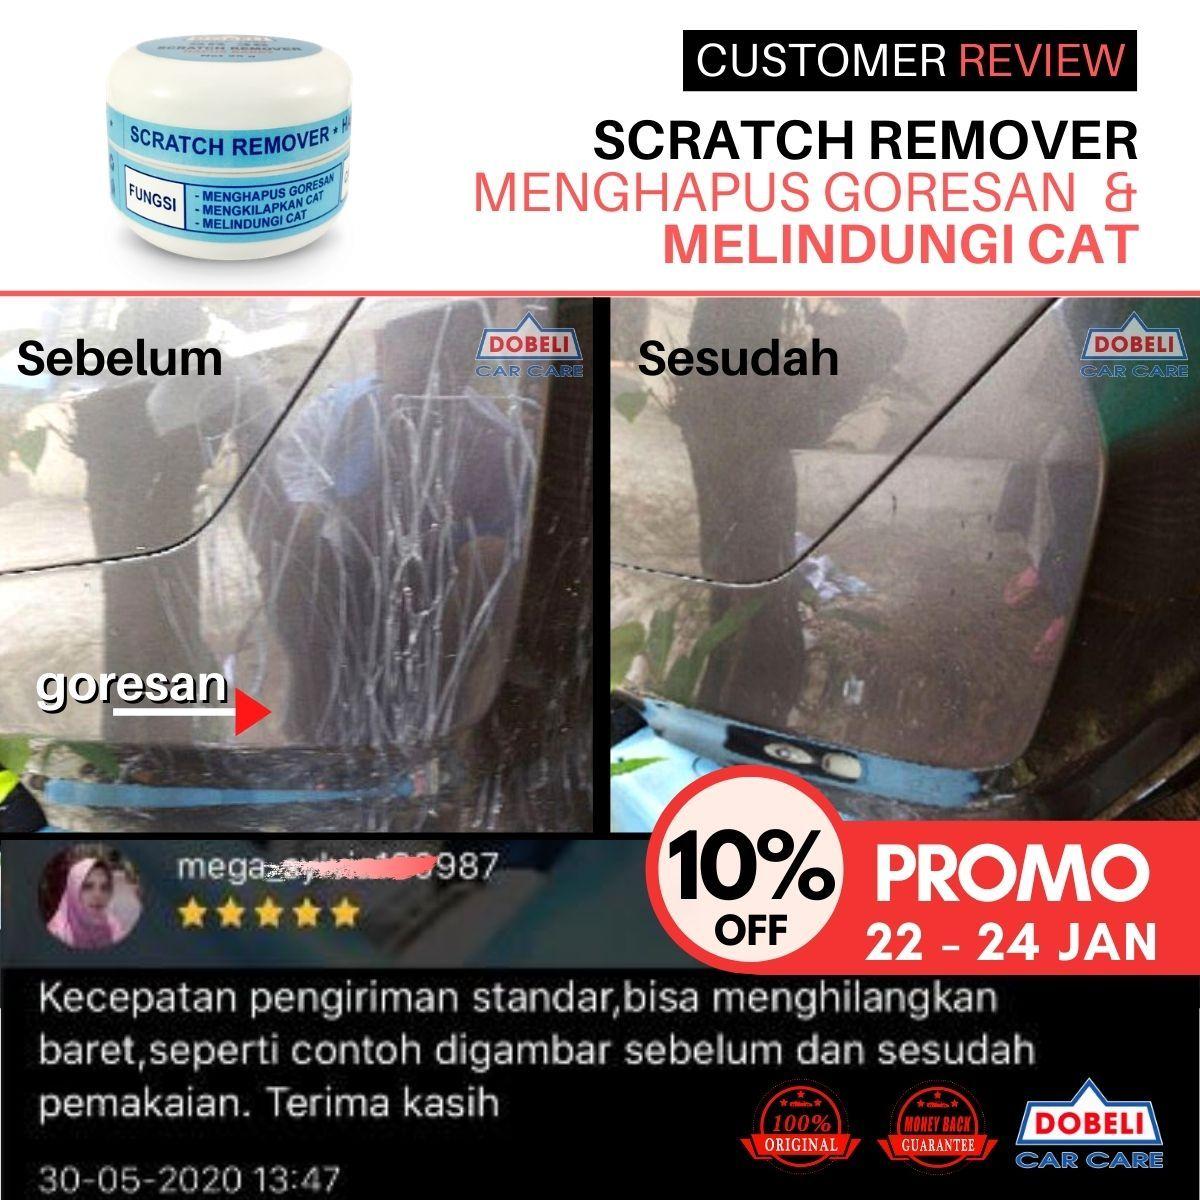 menghapus baret goresan cat mobil / motor / sepeda / kapal / .free microfiber! / scratch remover sr 36  l  hapus baret permukaan cat mobil  i  dijamin puas  l  25g